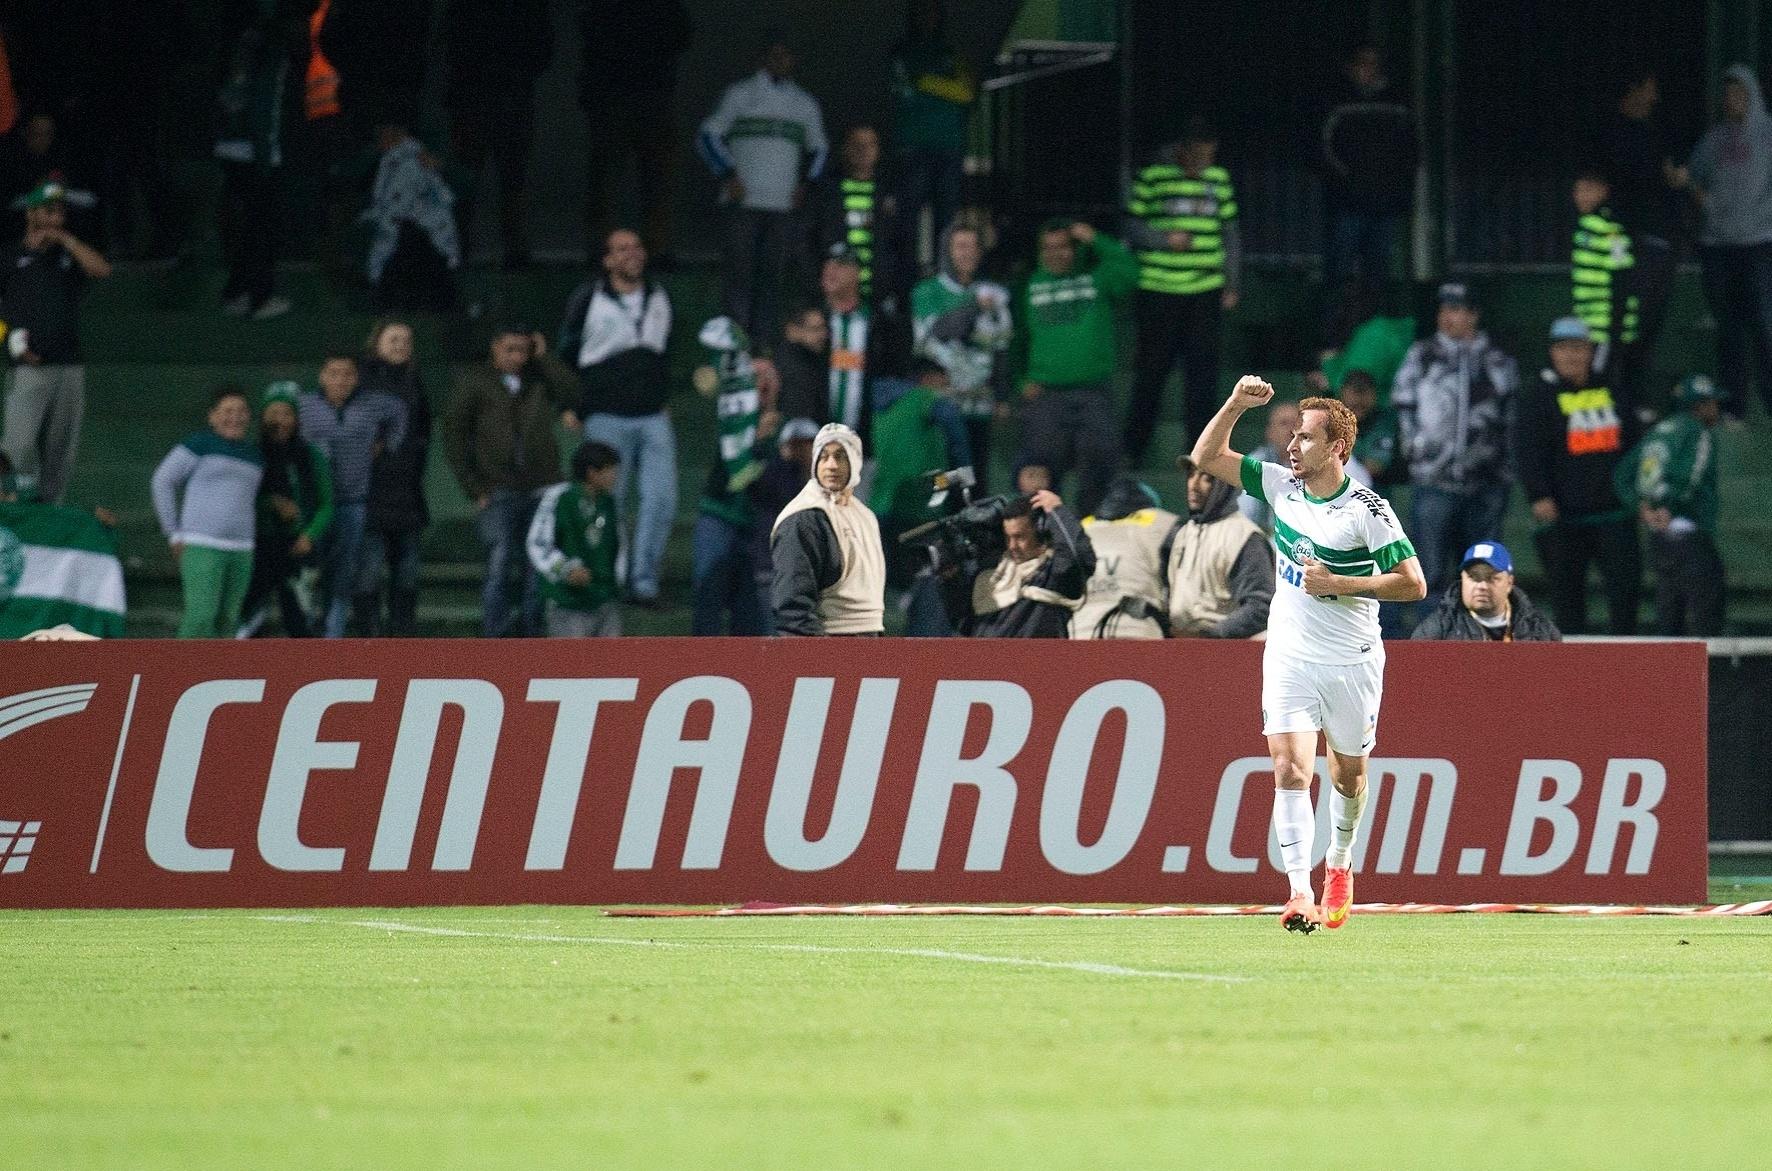 Zé Love comemora gol do Coritiba contra o Flamengo pela Copa do Brasil